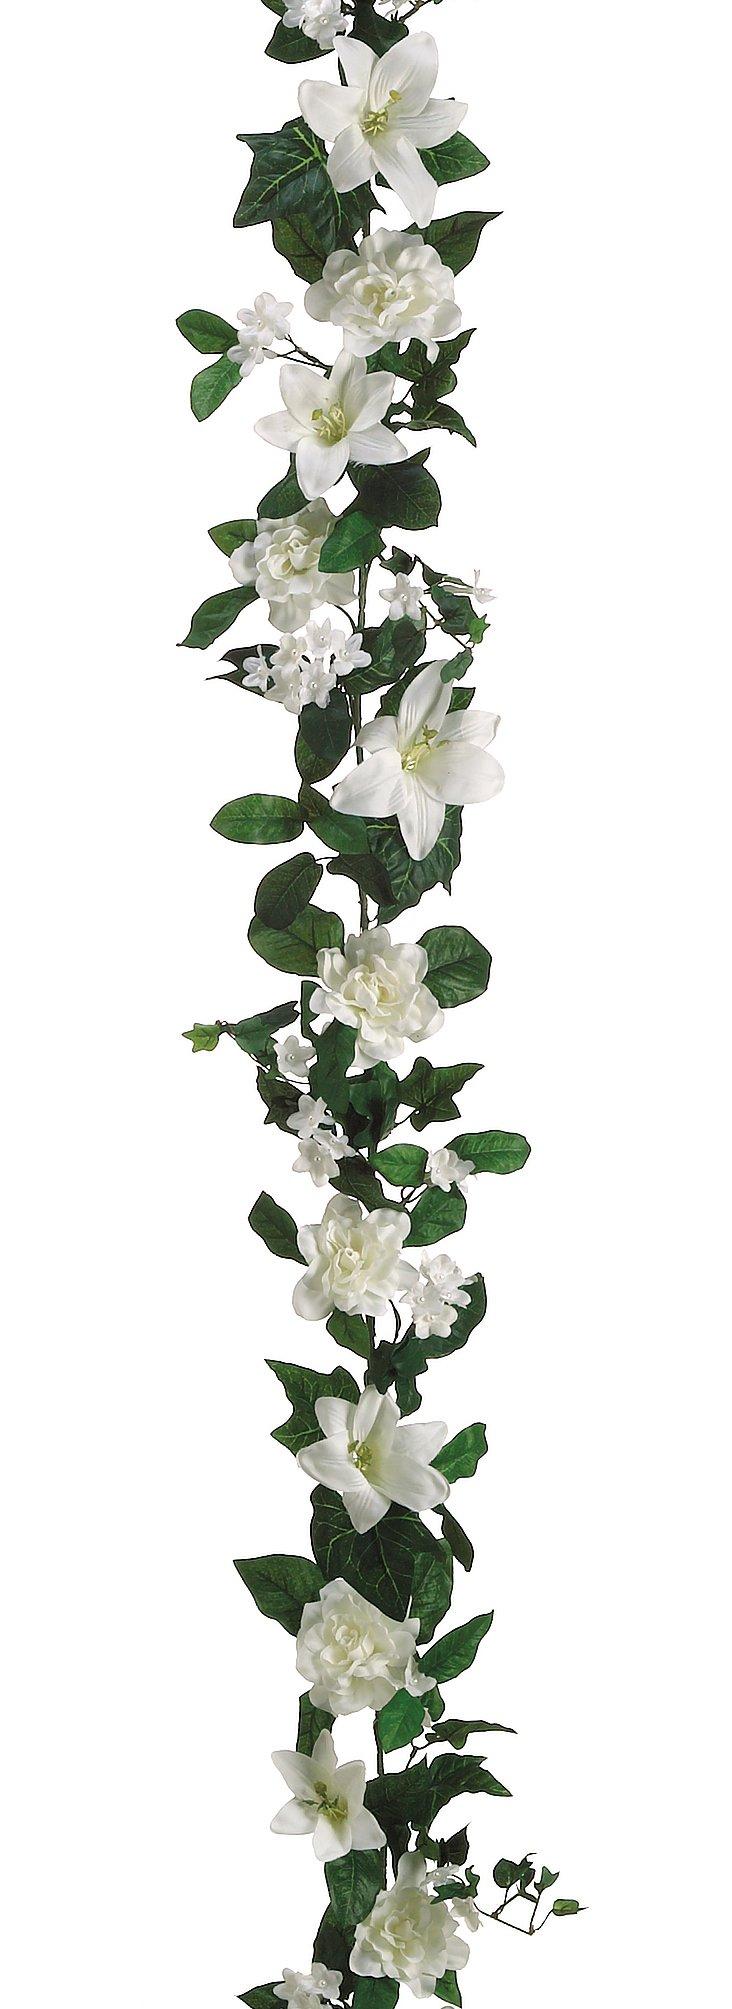 6' Lily & Gardenia Garland, Faux